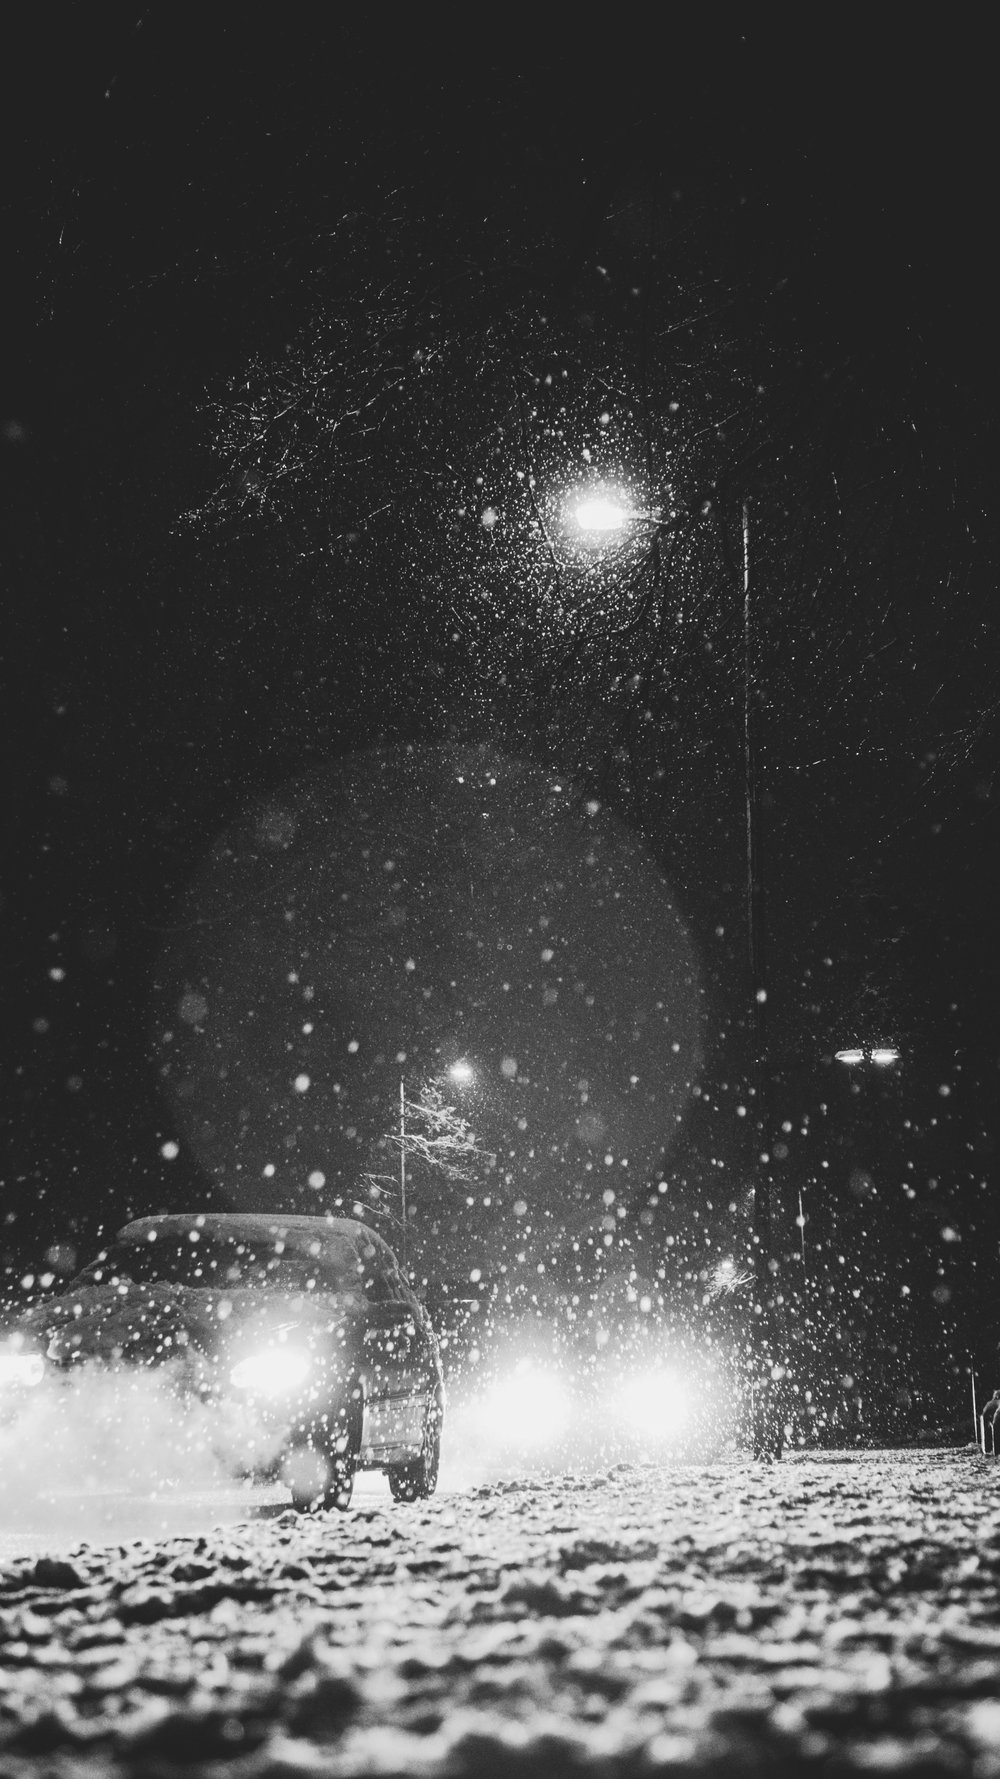 Cheltenham Snow Dec 17 pics-2.jpg